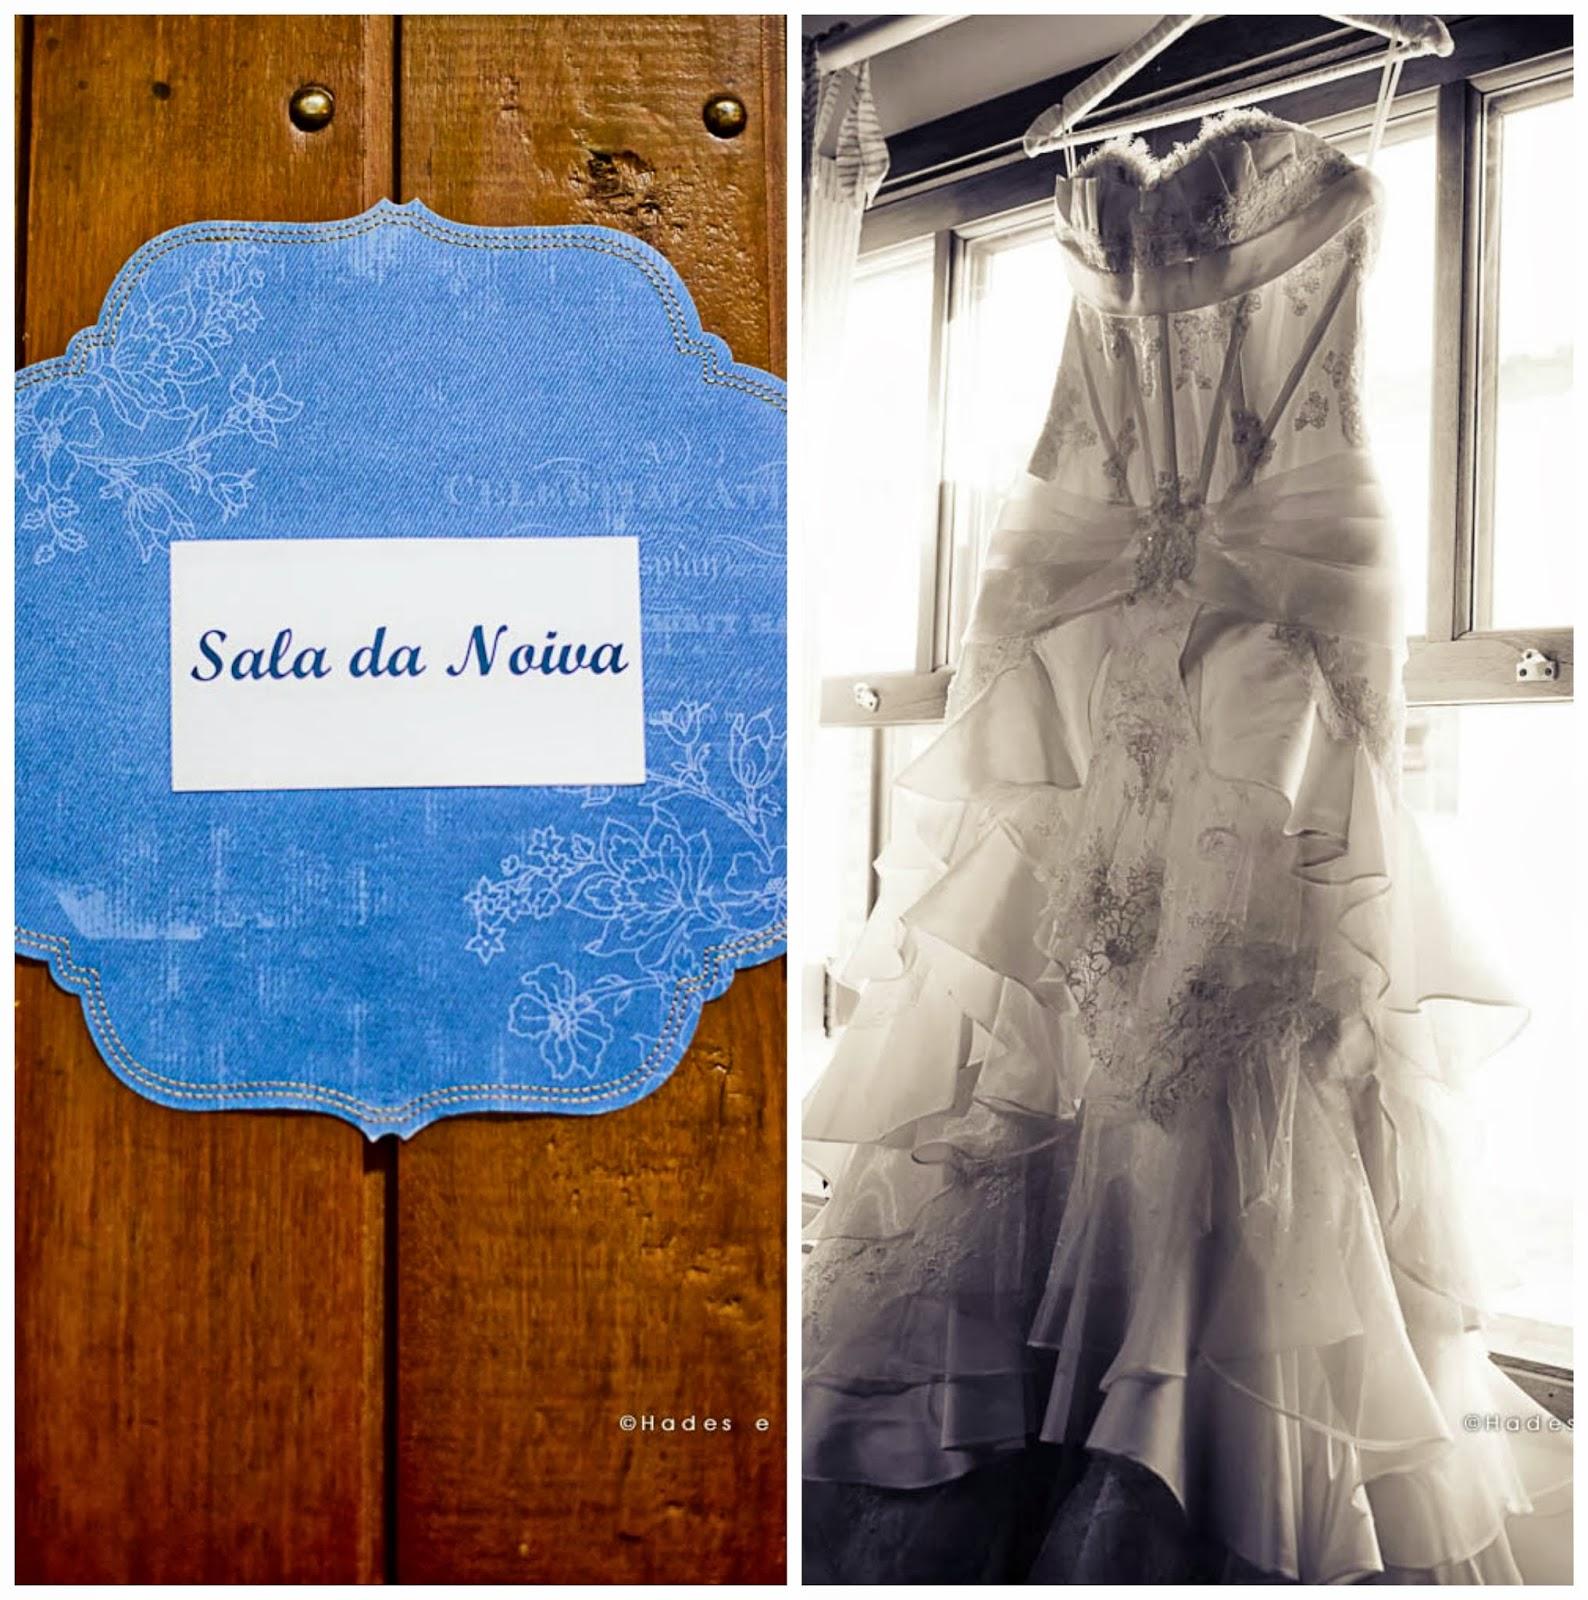 making of da noiva - dia da noiva - making of - noiva - vestido de noiva - vestido - aviso na porta da noiva